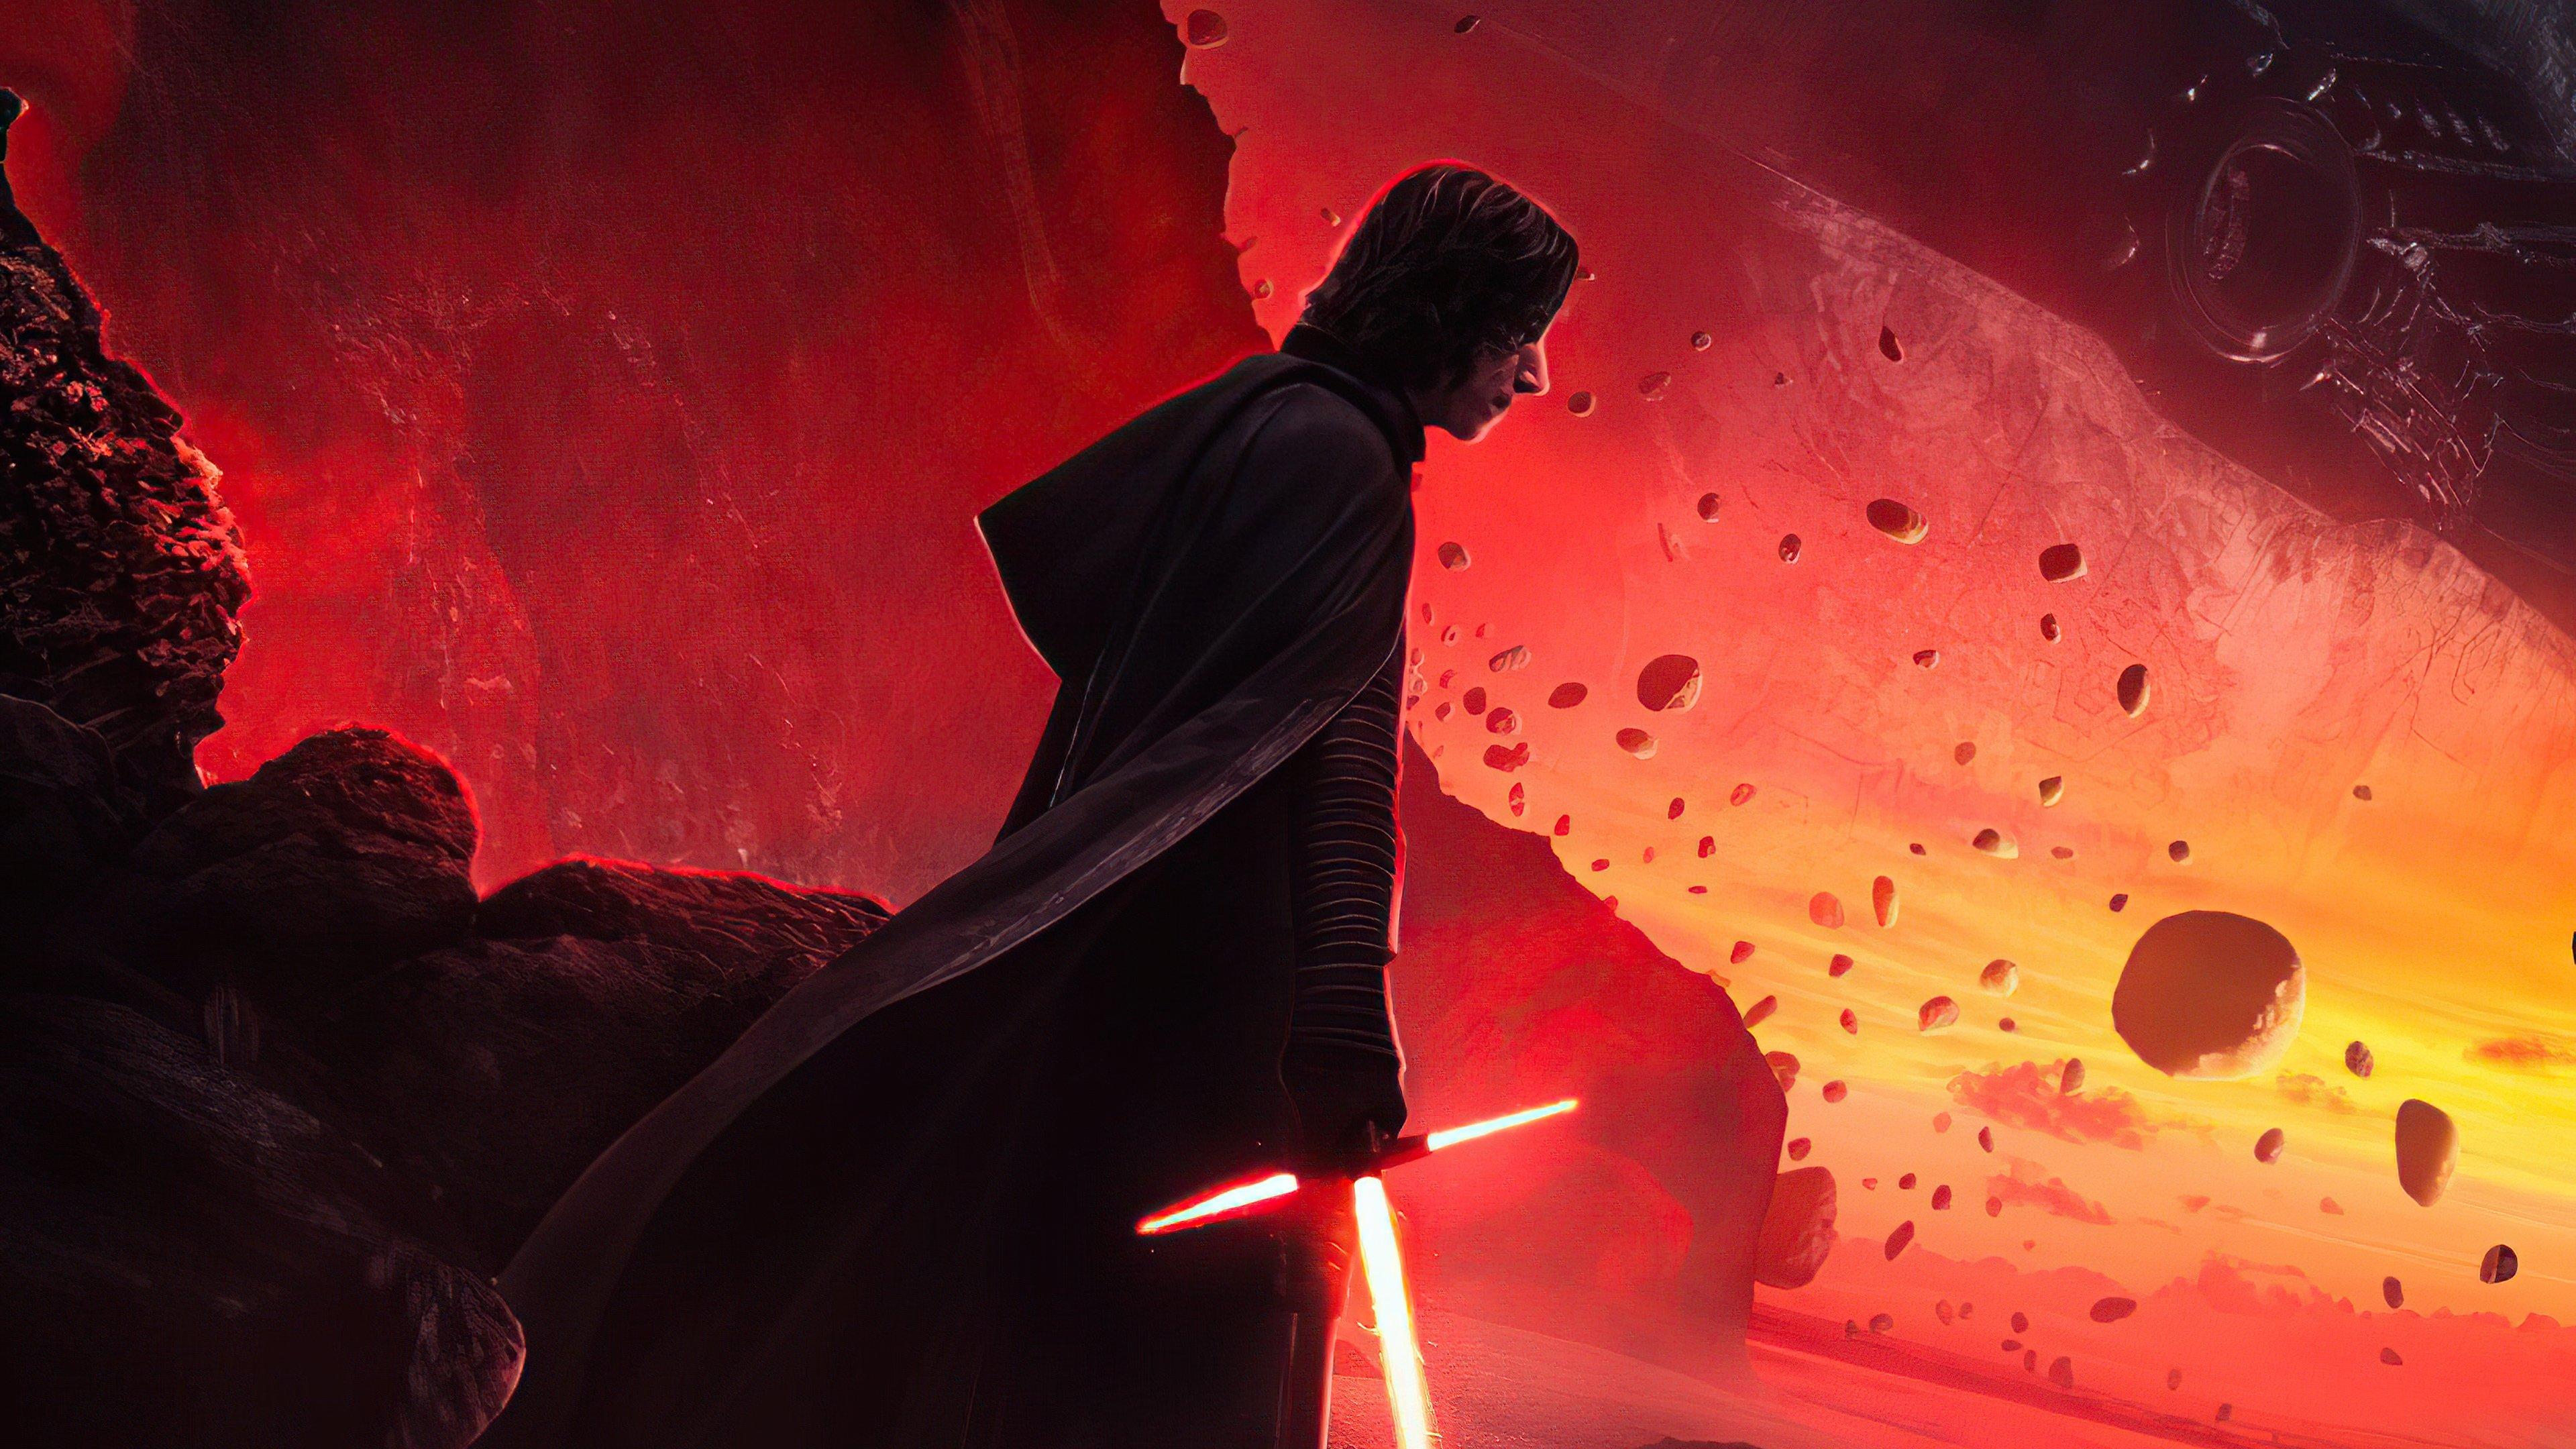 Wallpaper Kylo Ren Star Wars Lightsaber